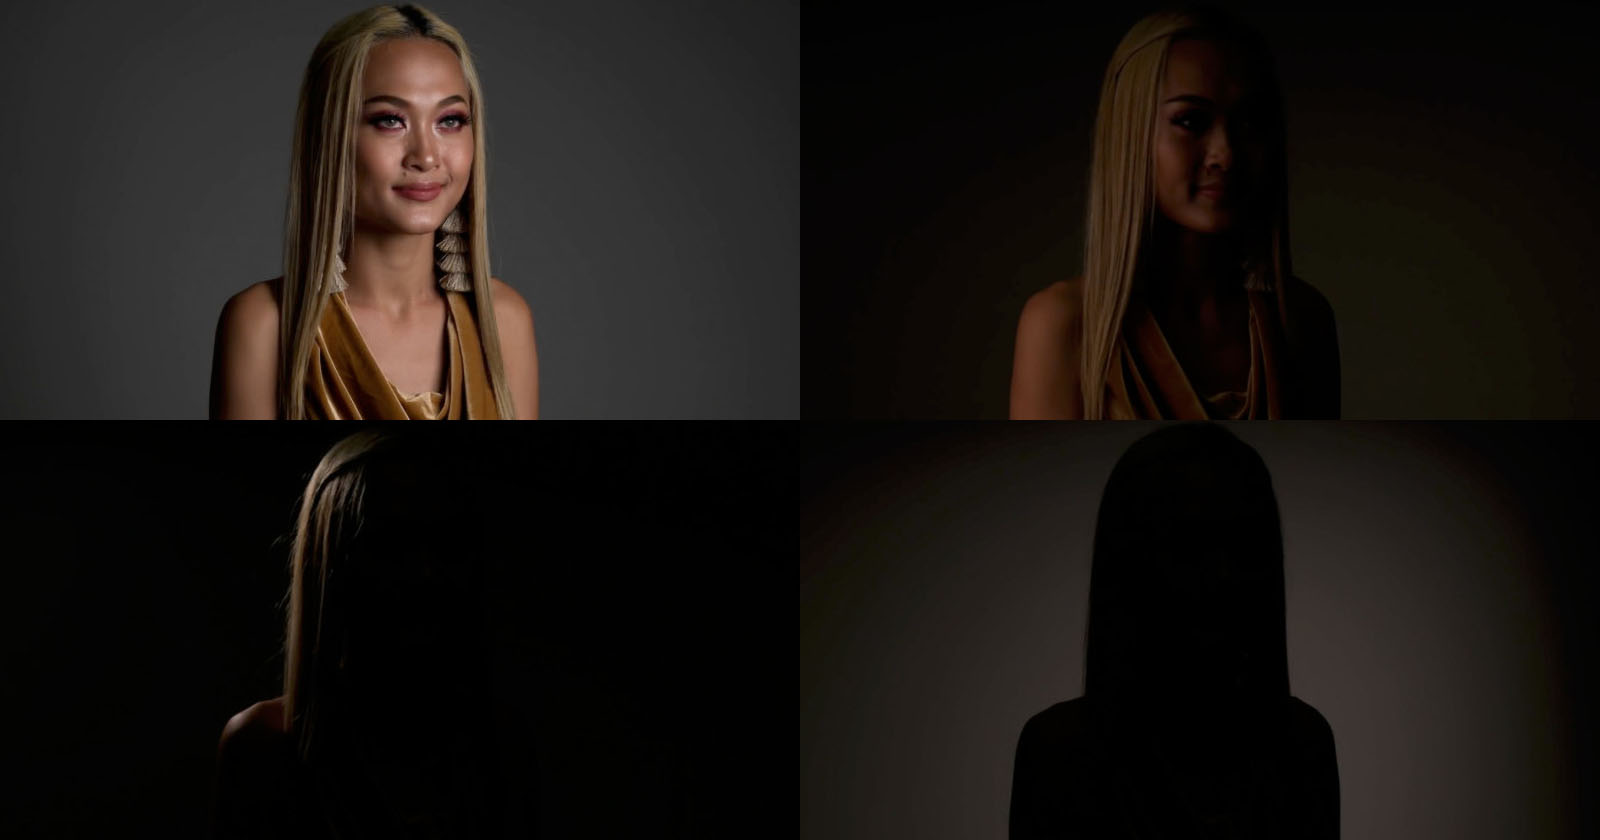 Basic Studio Lighting Setup Portraits